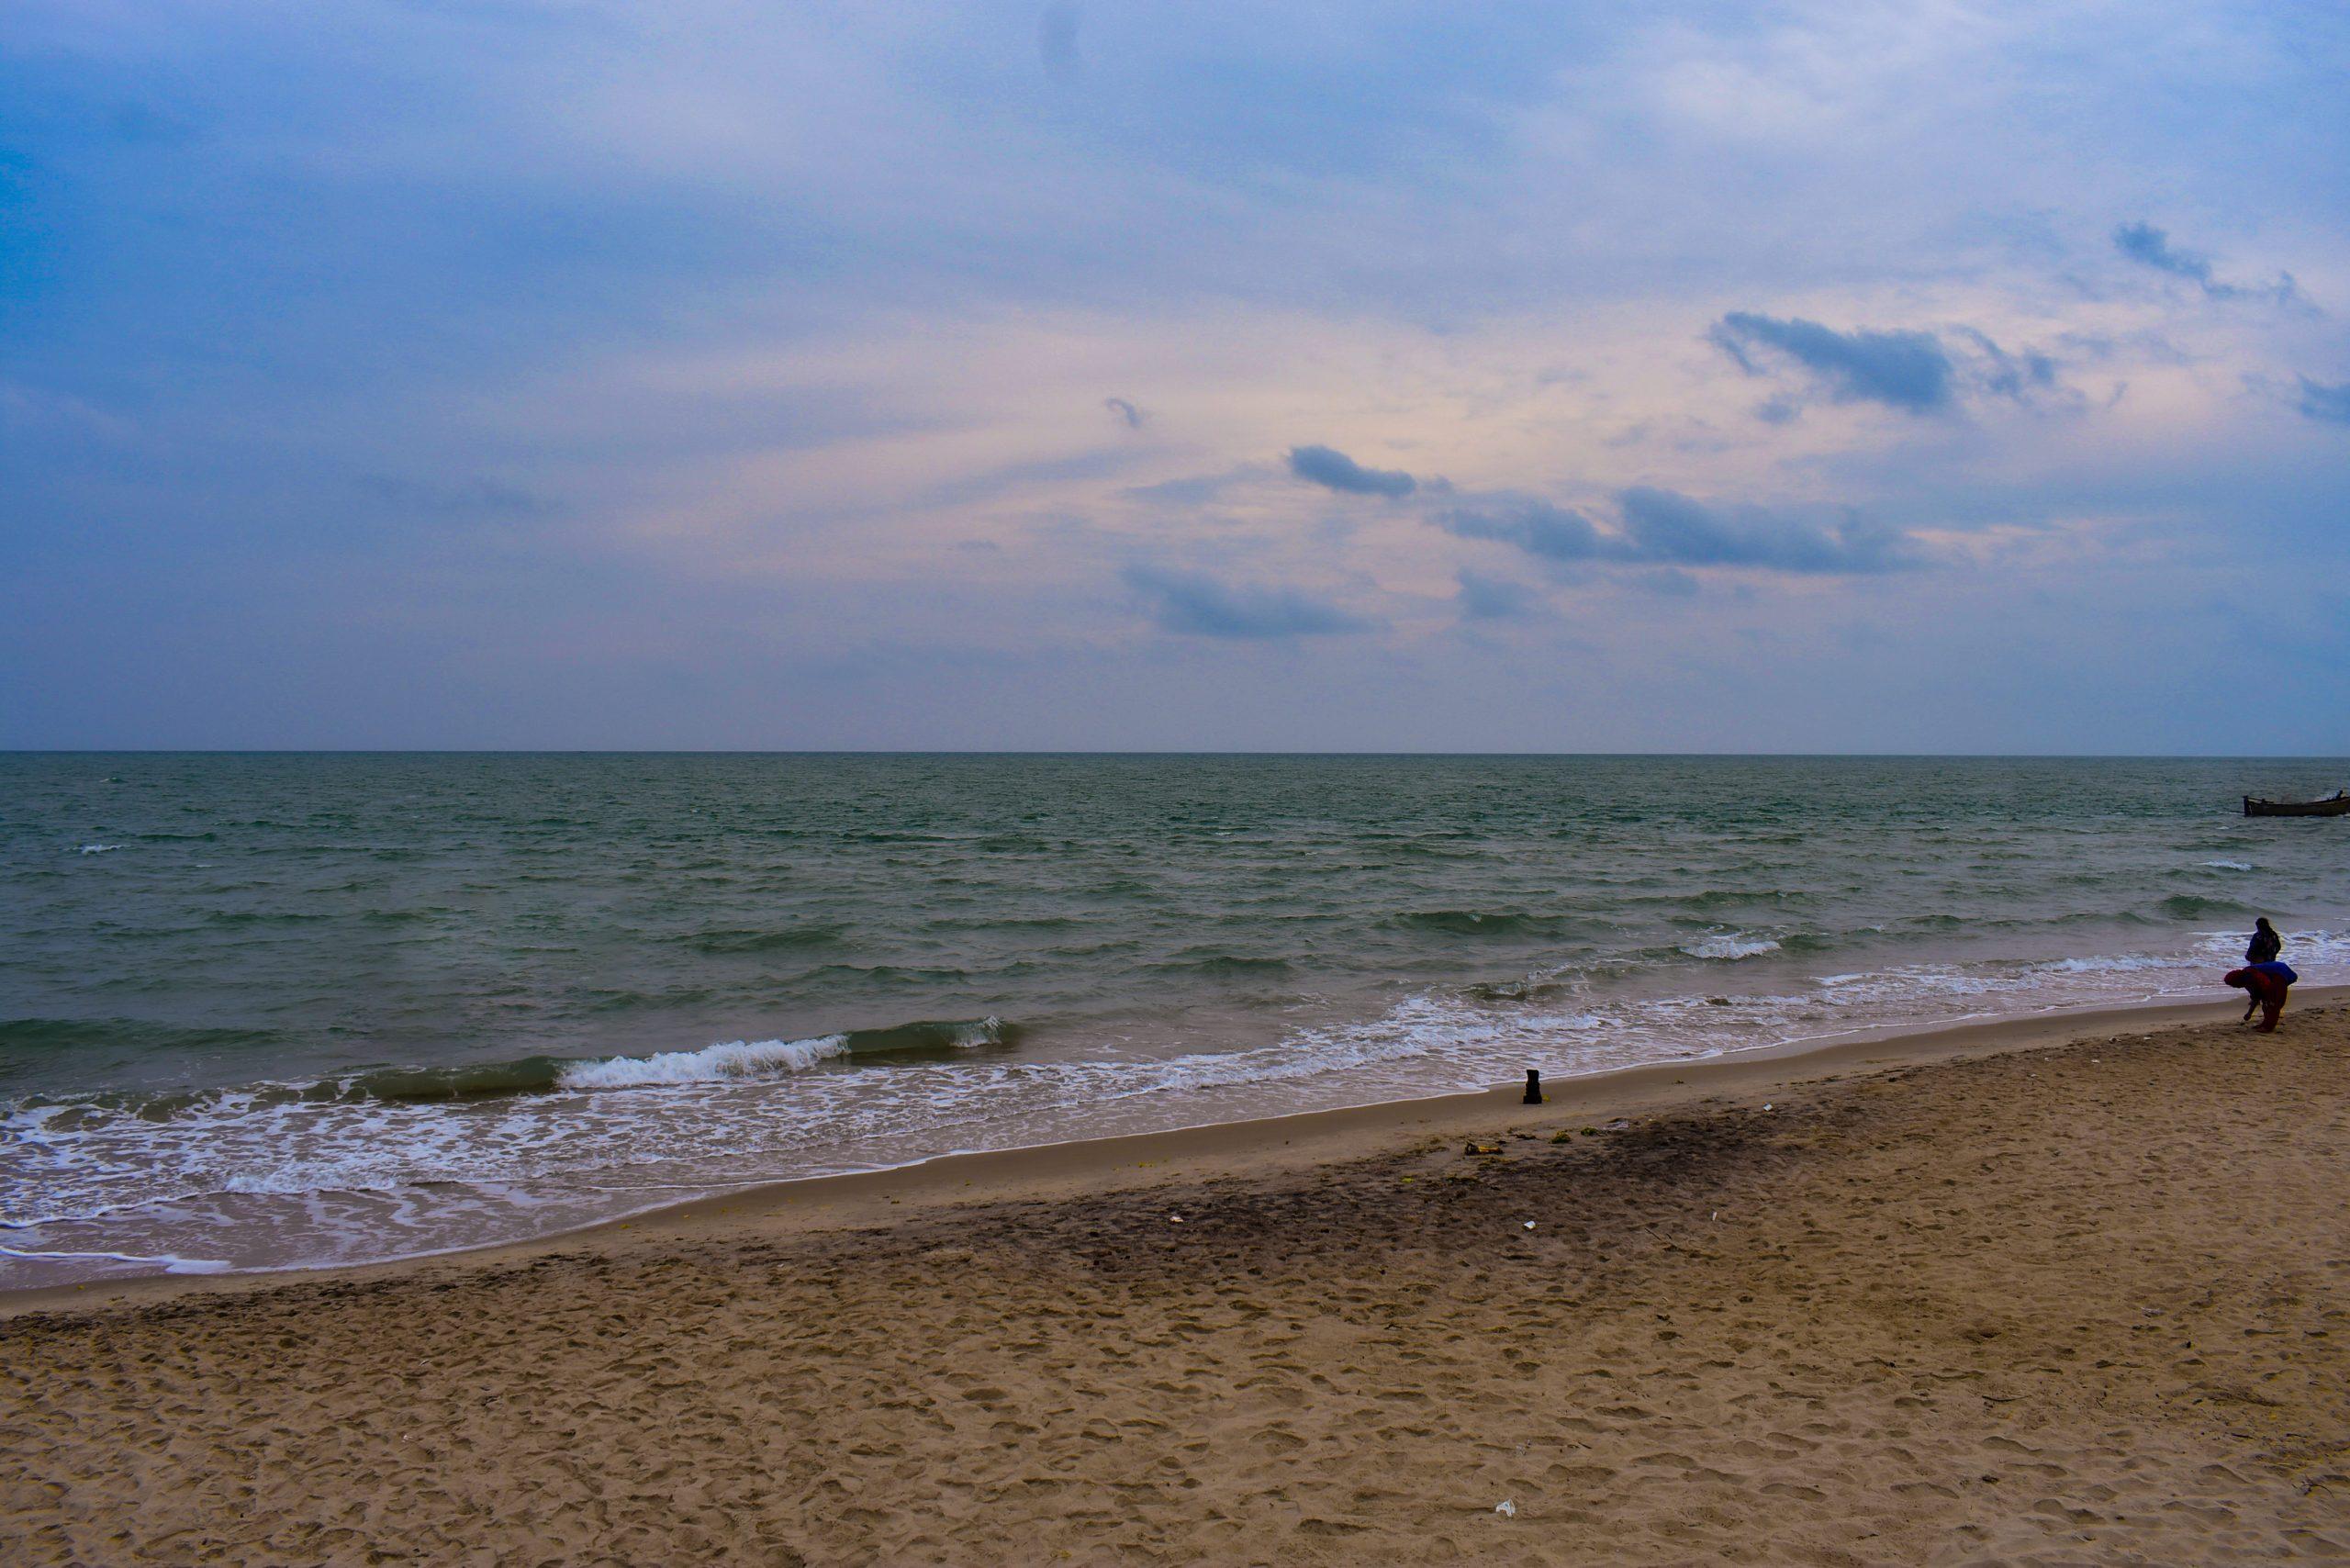 The edge of India - Dhanushkodi Beach